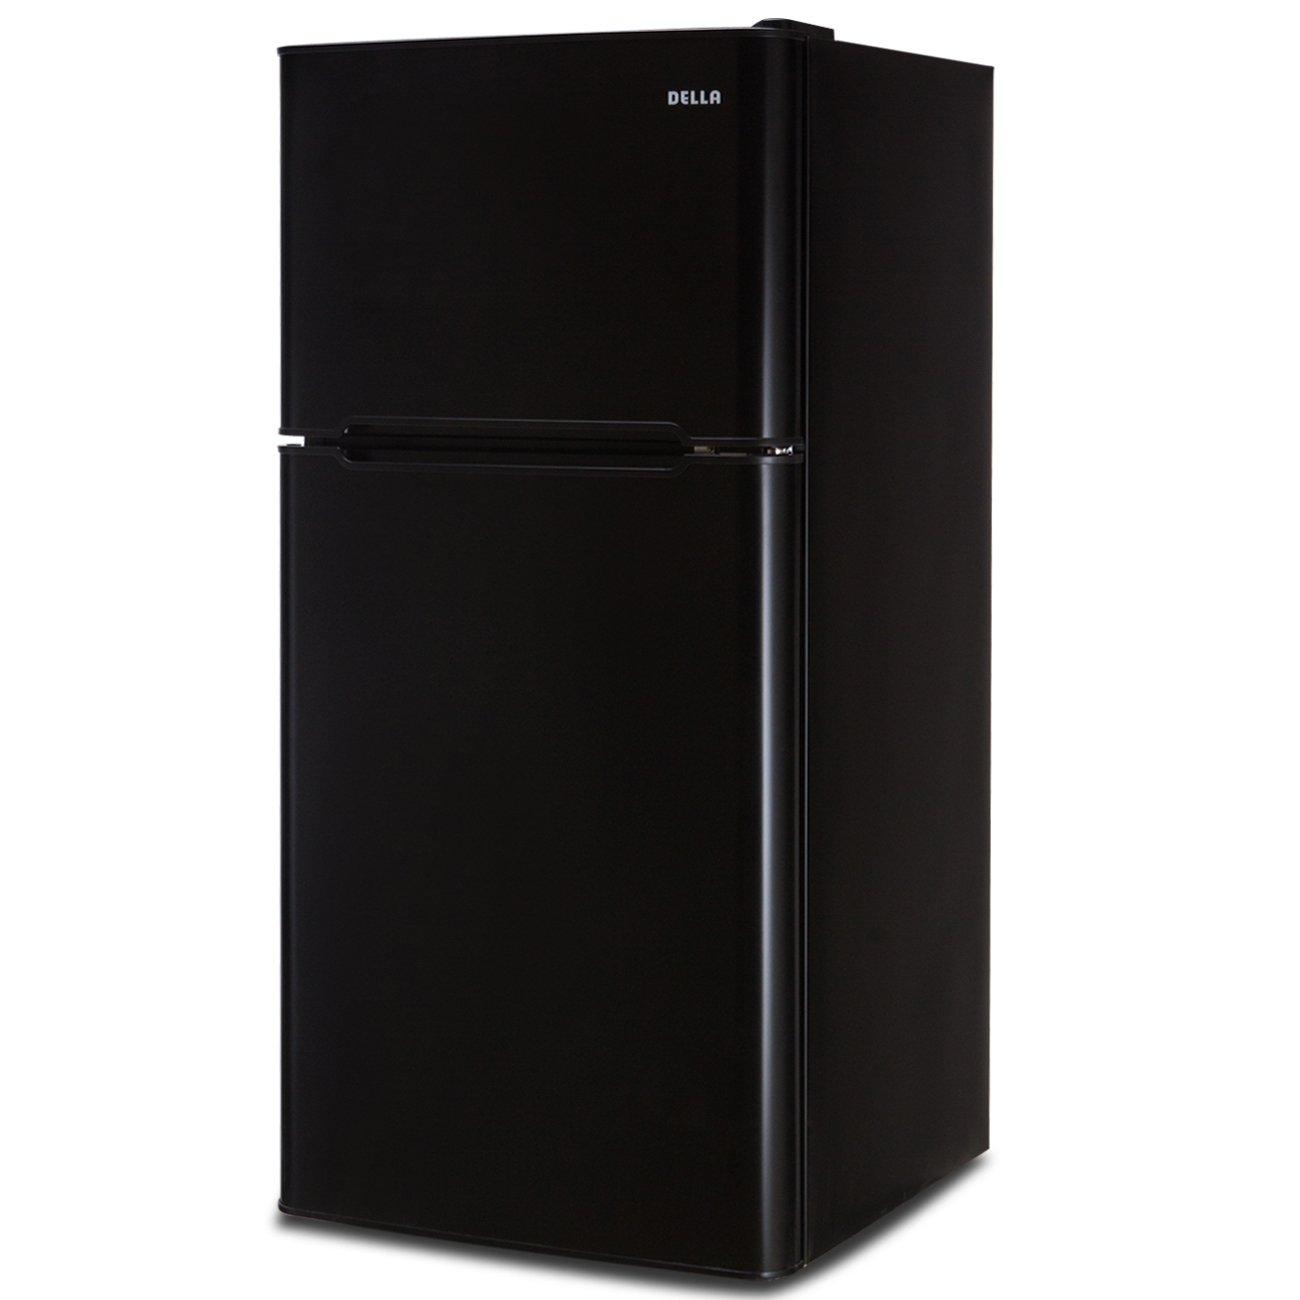 Della Compact Double Door Refrigerator and Freezer Cans Soda Drink Food, 4.5 Cubic Feet, Black